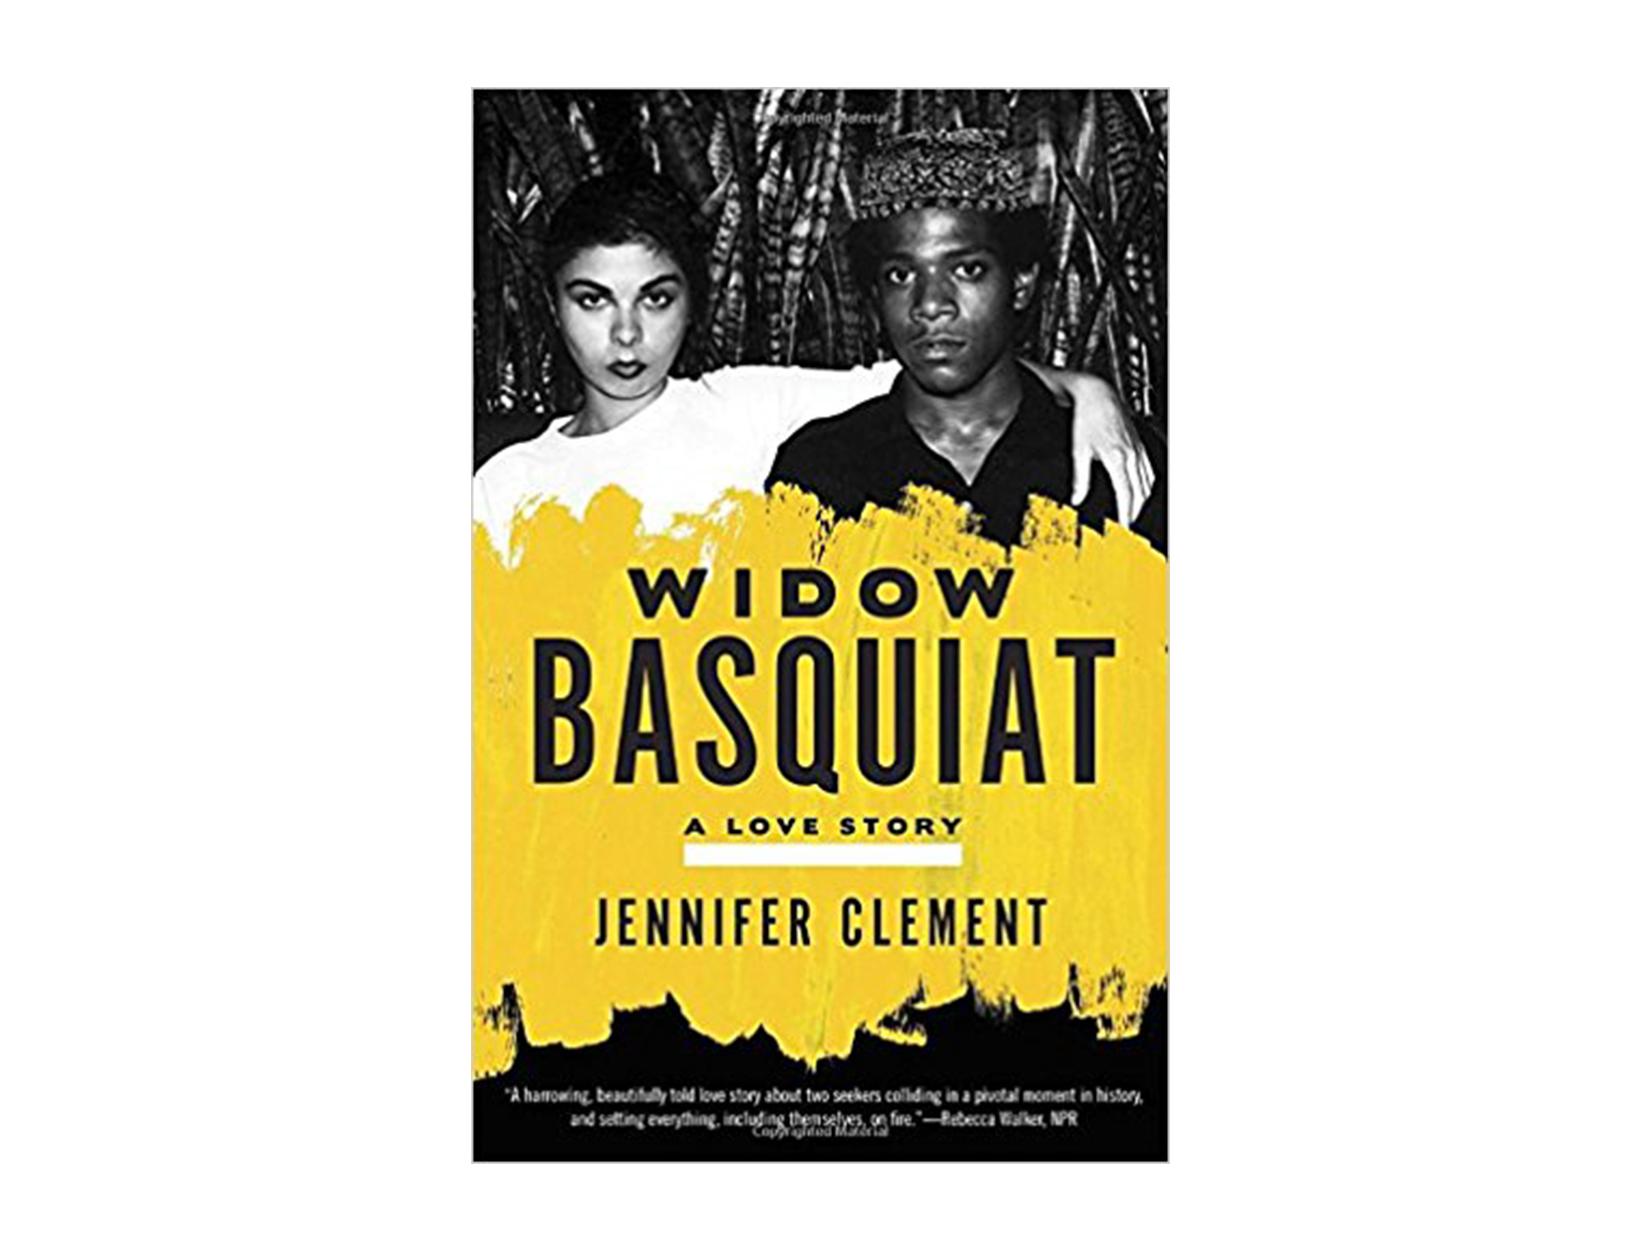 Widow Basquiat: A Love Story by Jennifer Clement